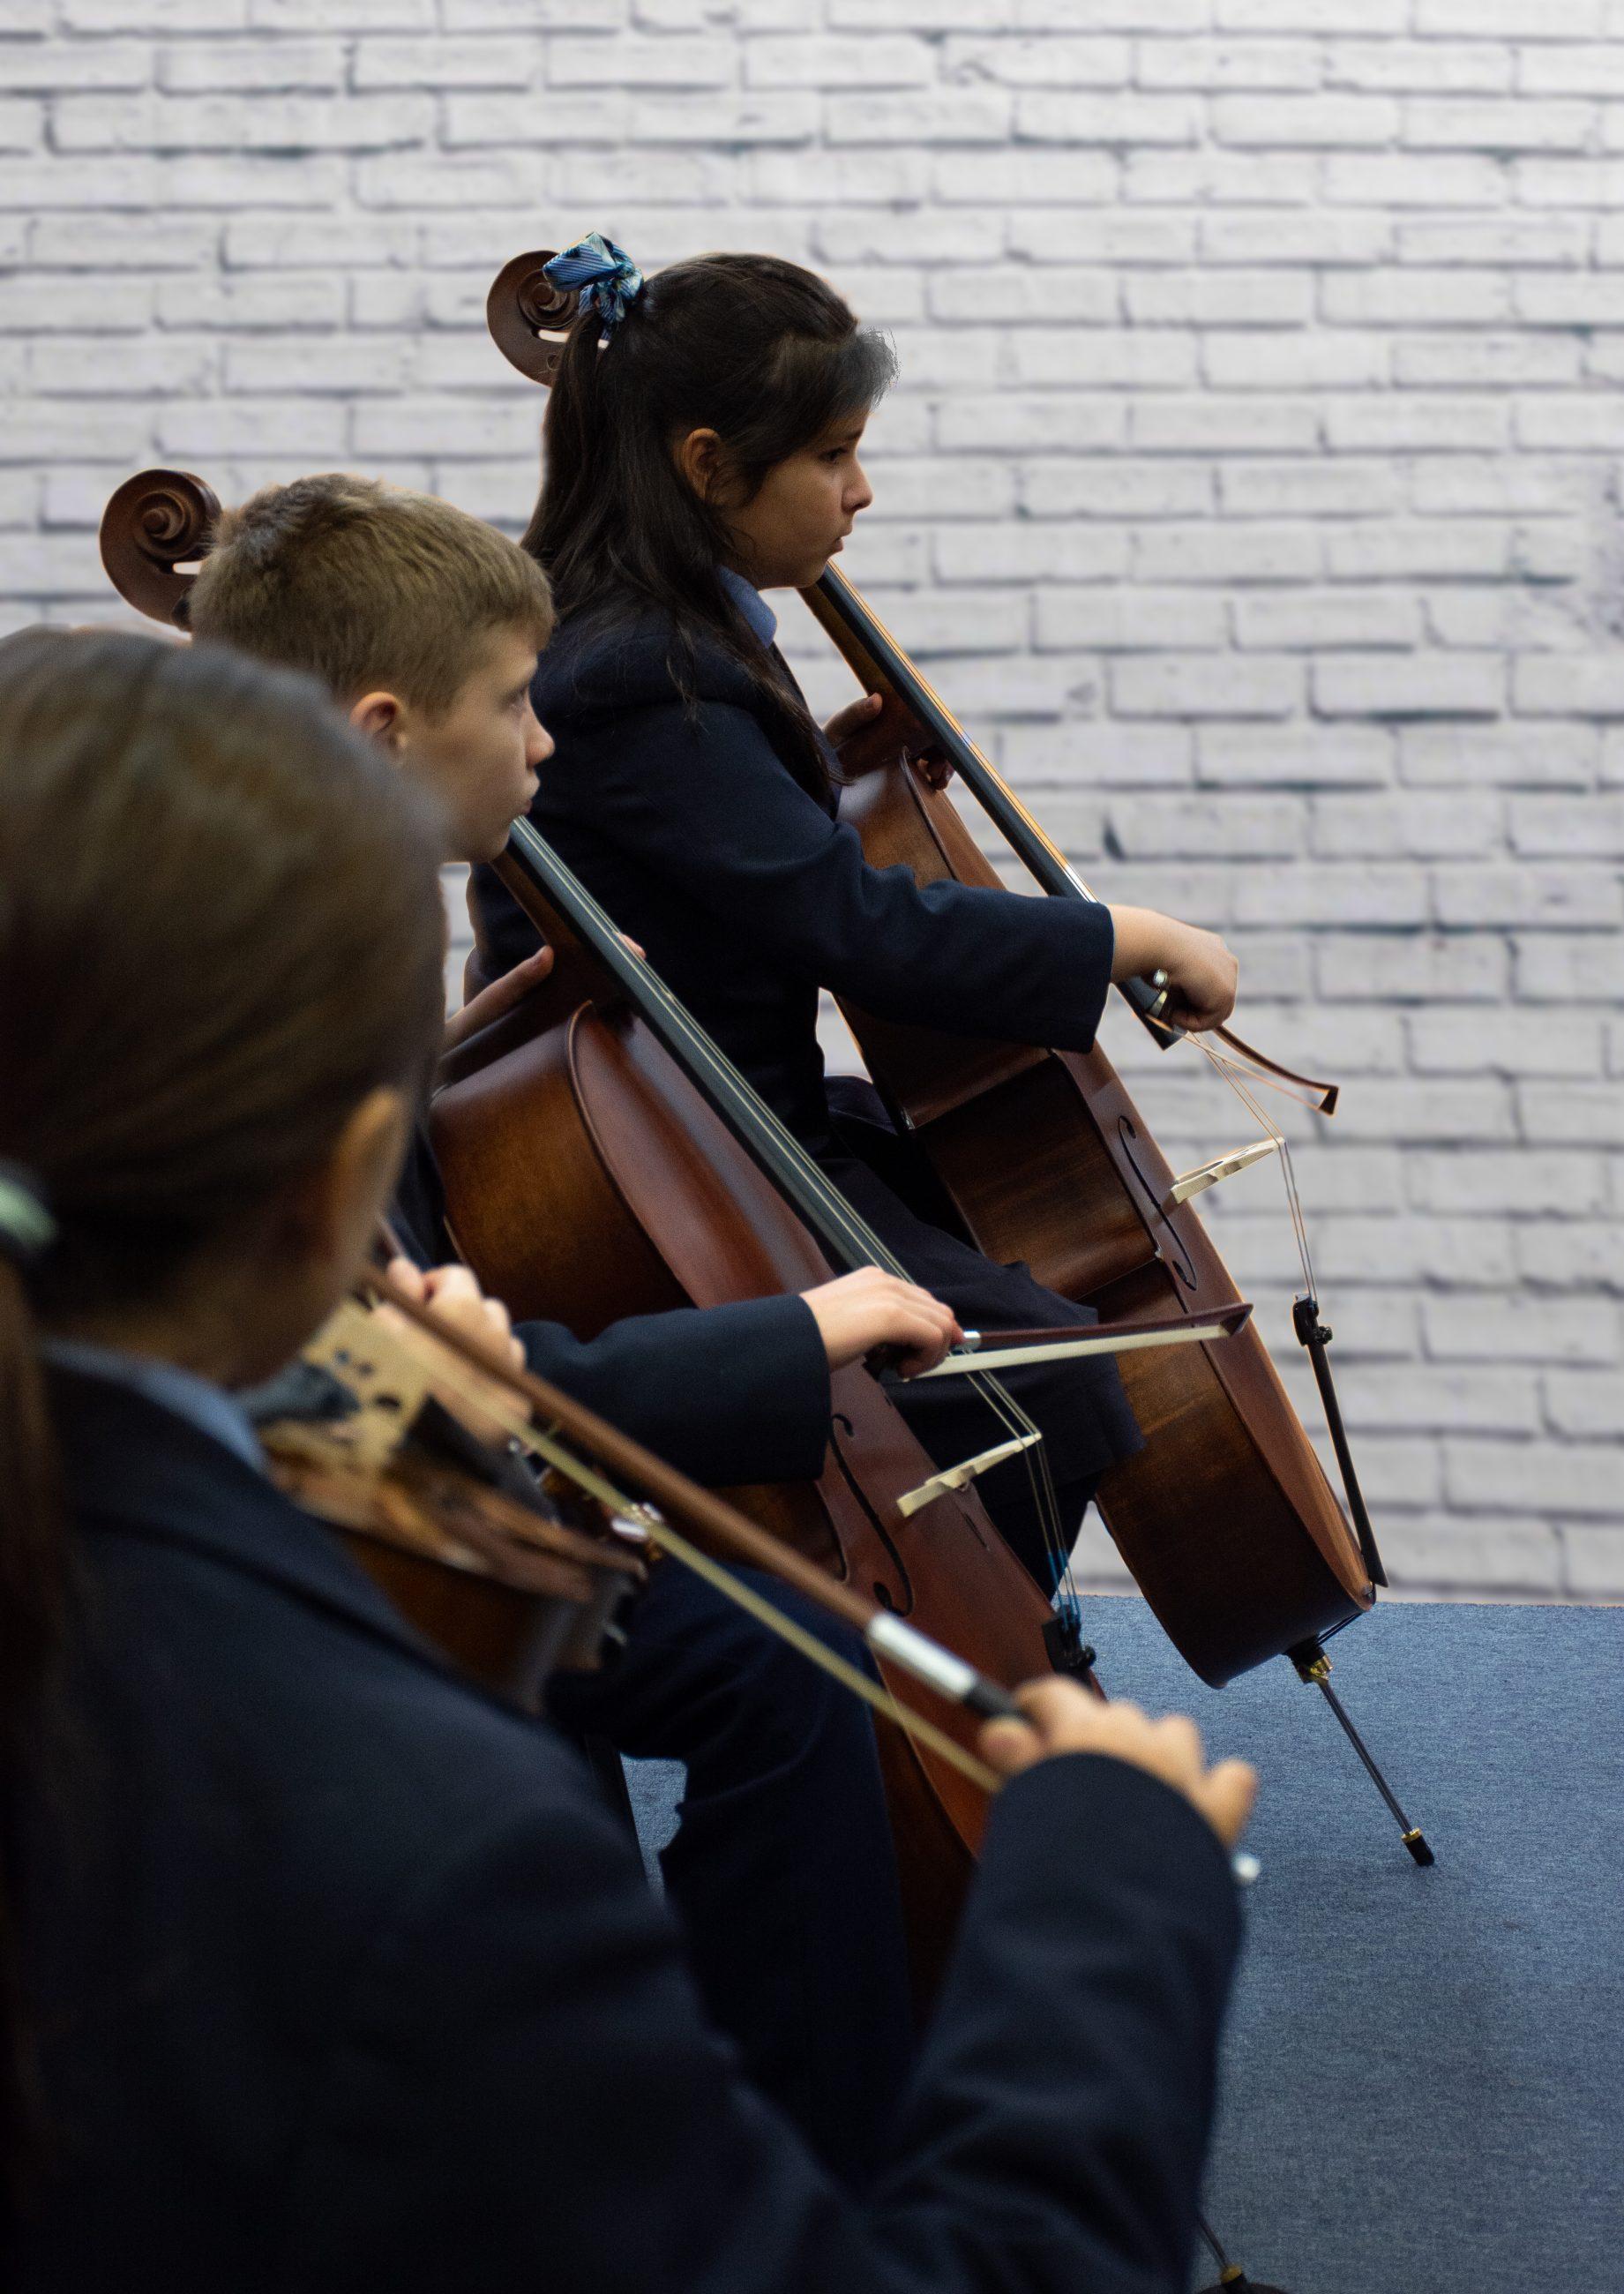 Music & Performing Arts - 1